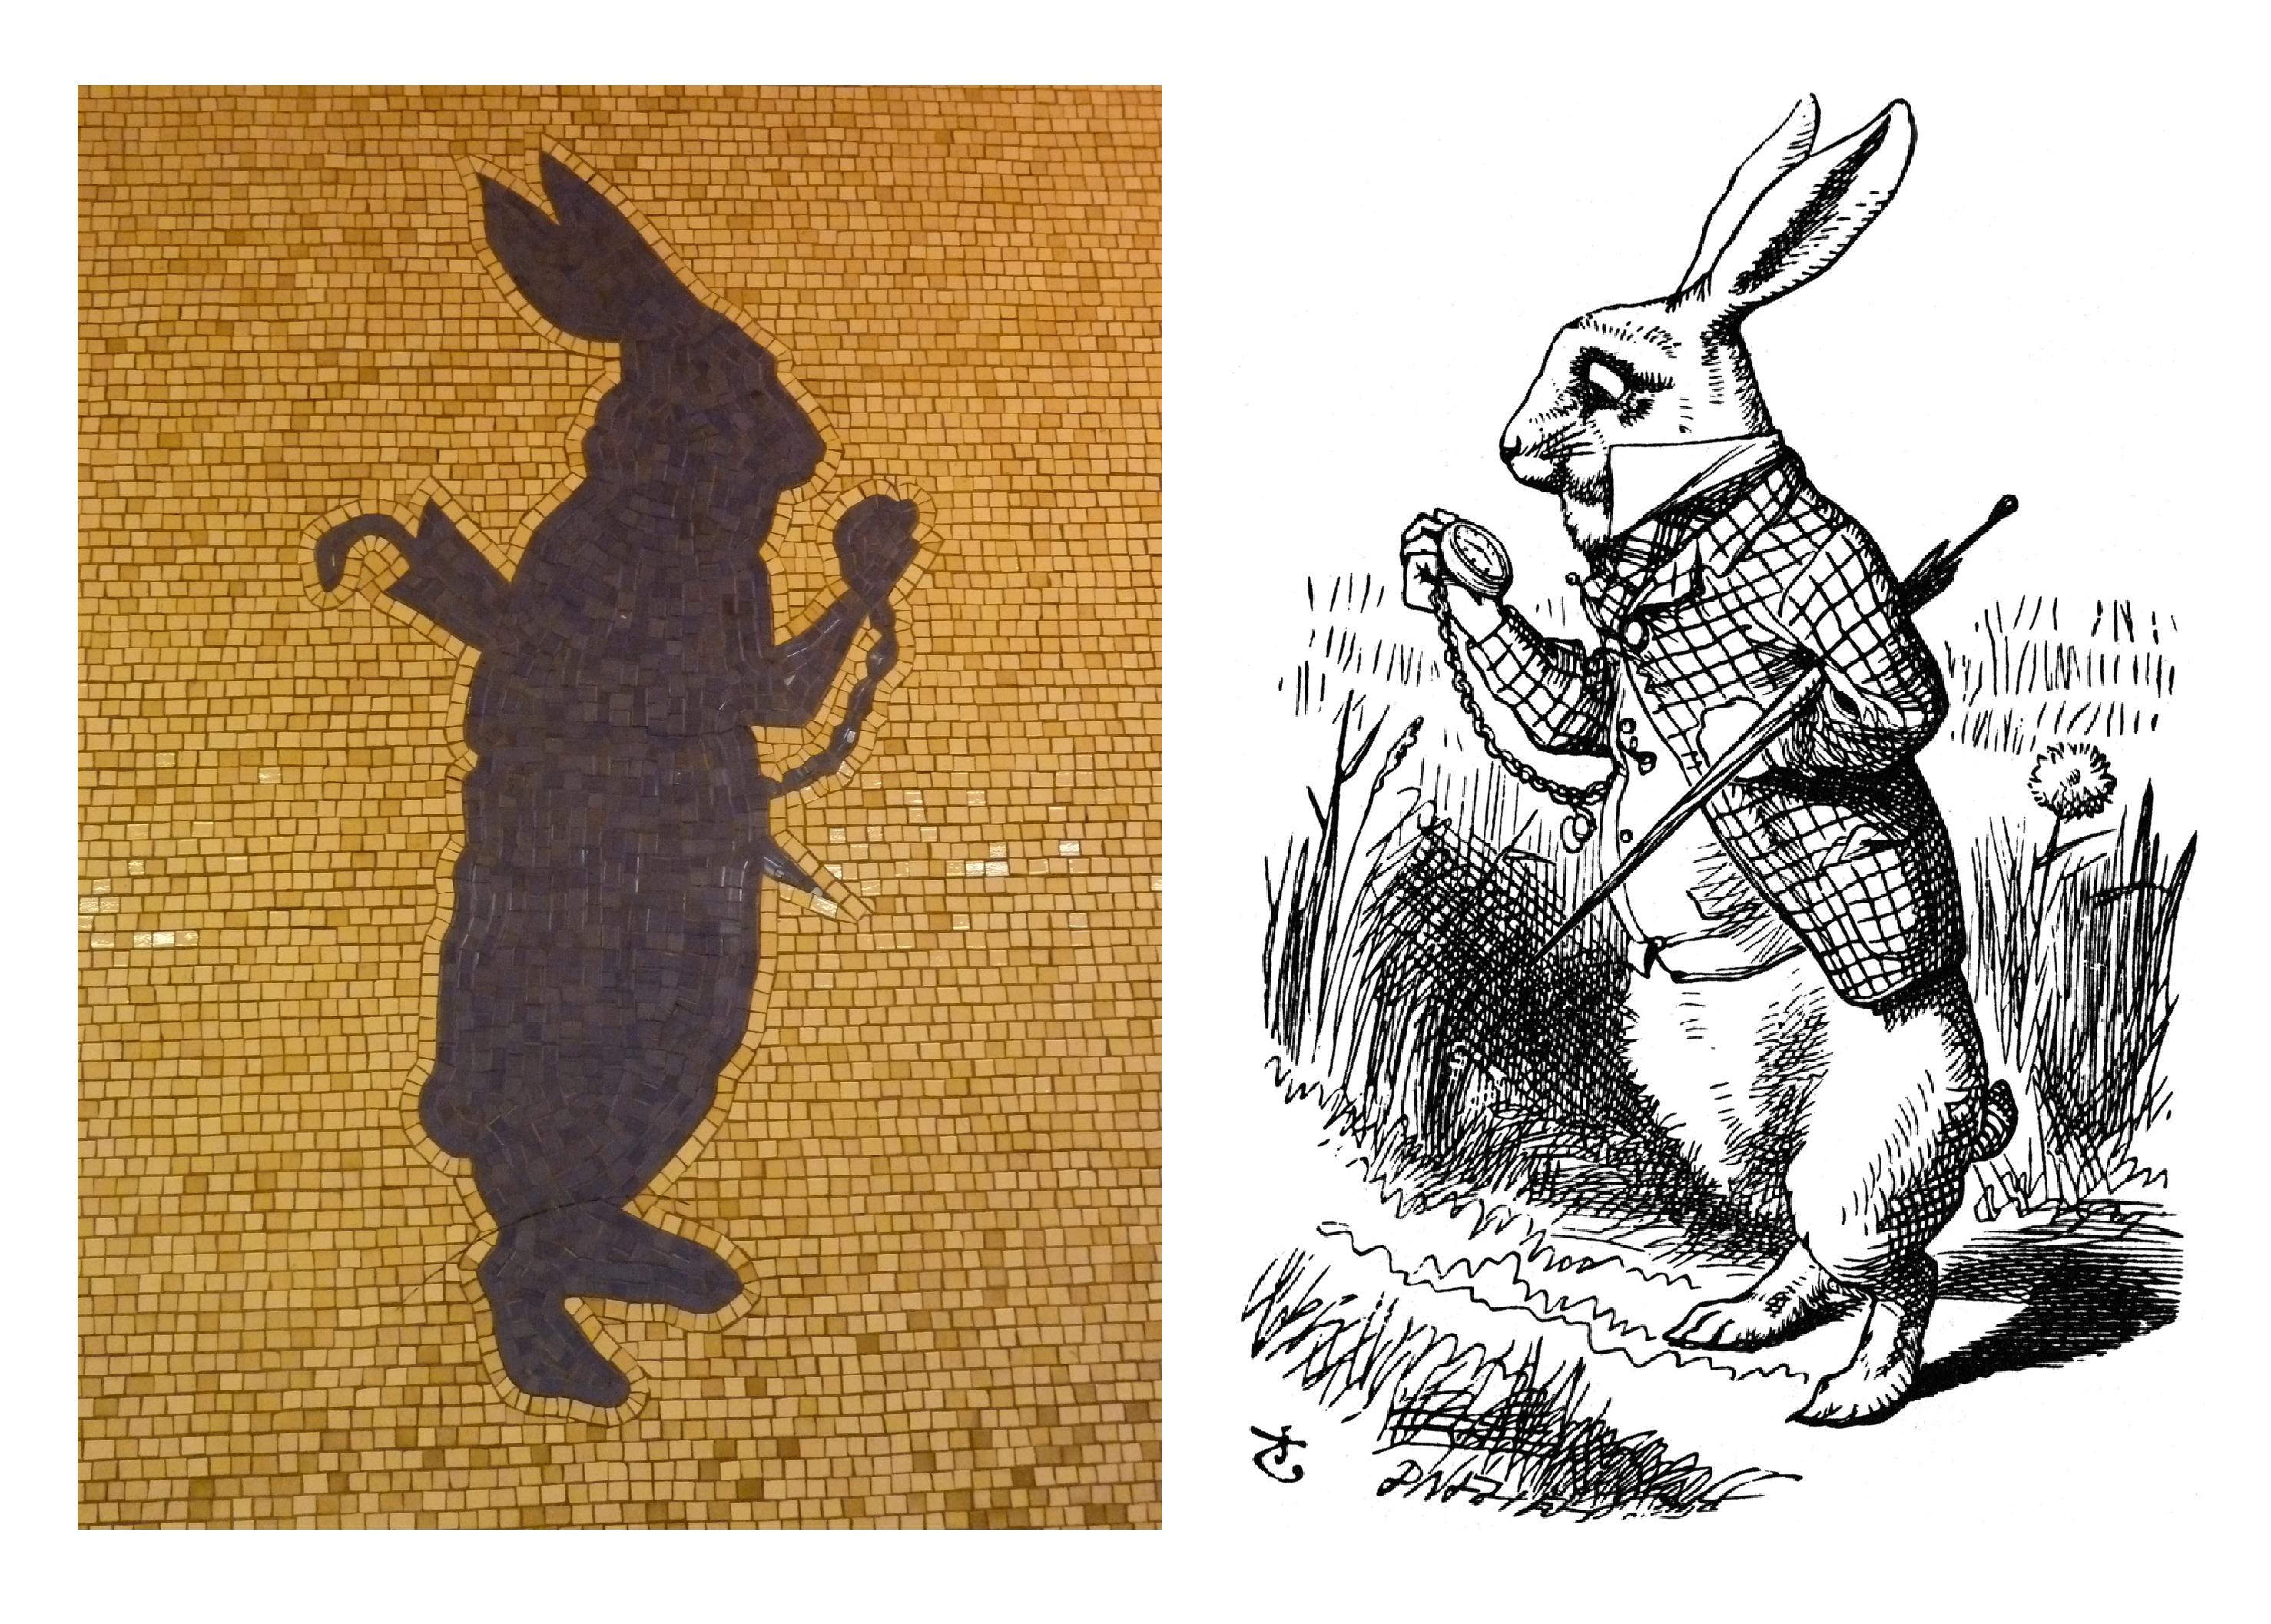 Alice Amp Her Wonderland Pals As Subway Art Walkaboutny